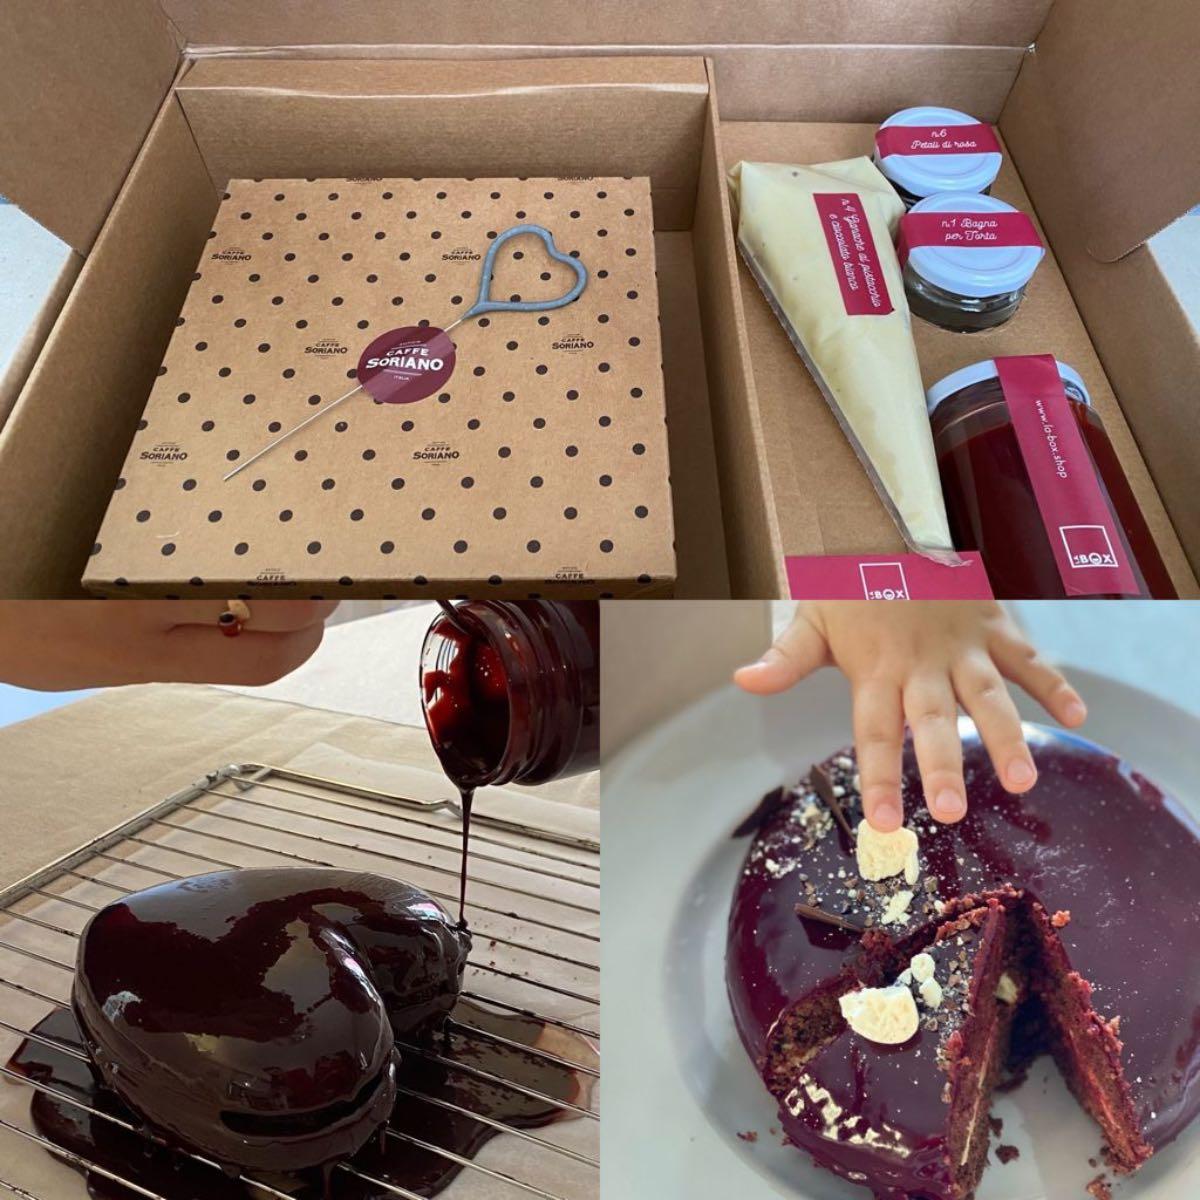 Festa della mamma - kit torta box